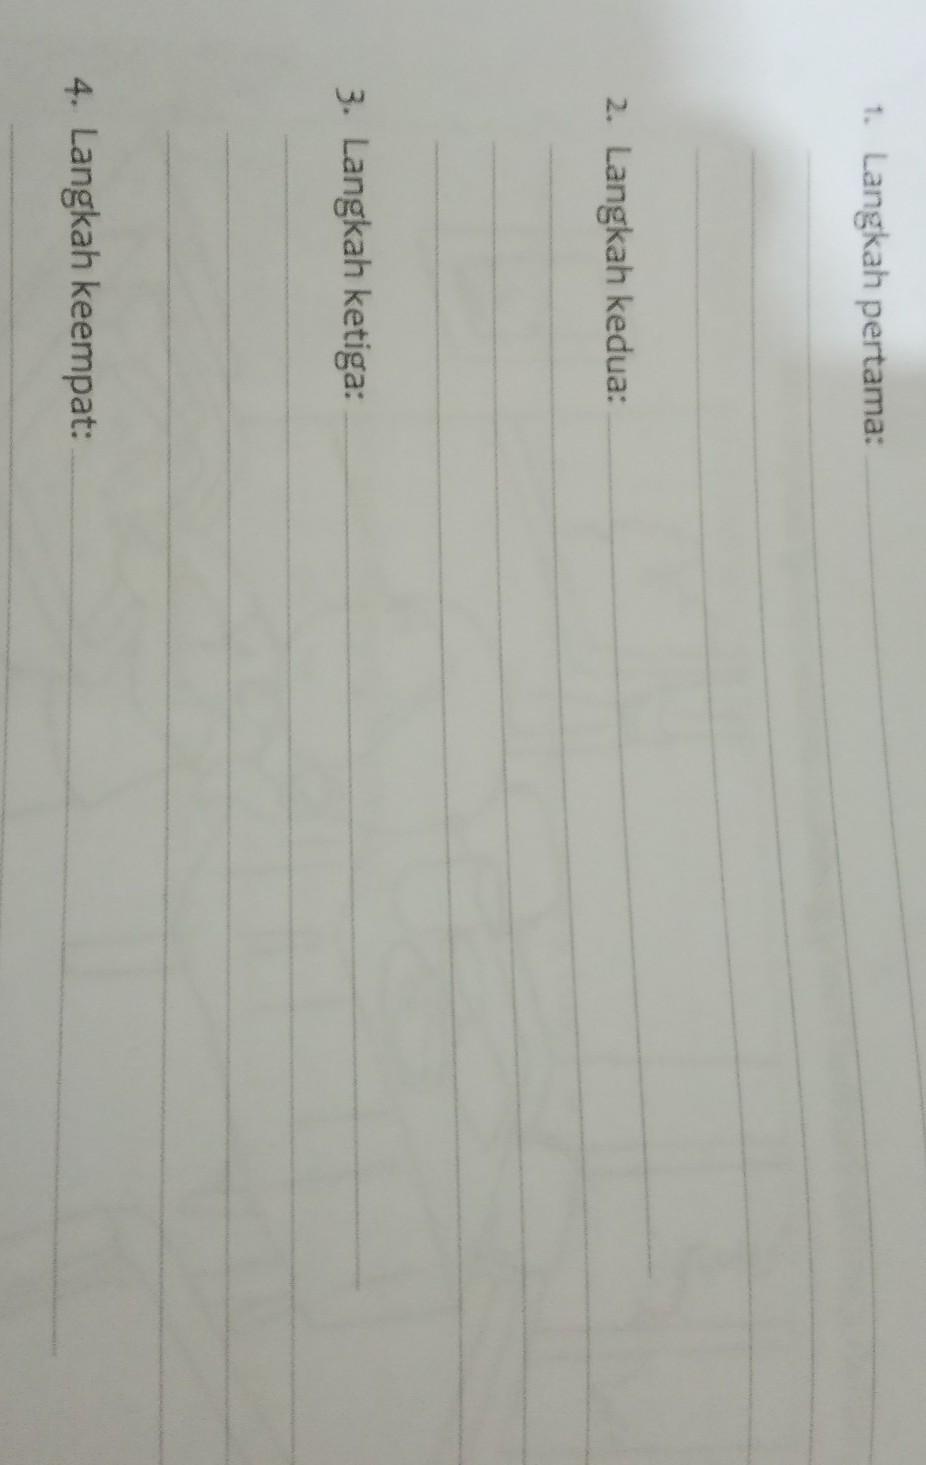 Sebutkan Langkah Langkah Menulis Cerpen : sebutkan, langkah, menulis, cerpen, Sebutkan, Langkah, Membuat, Gambar, Cerita